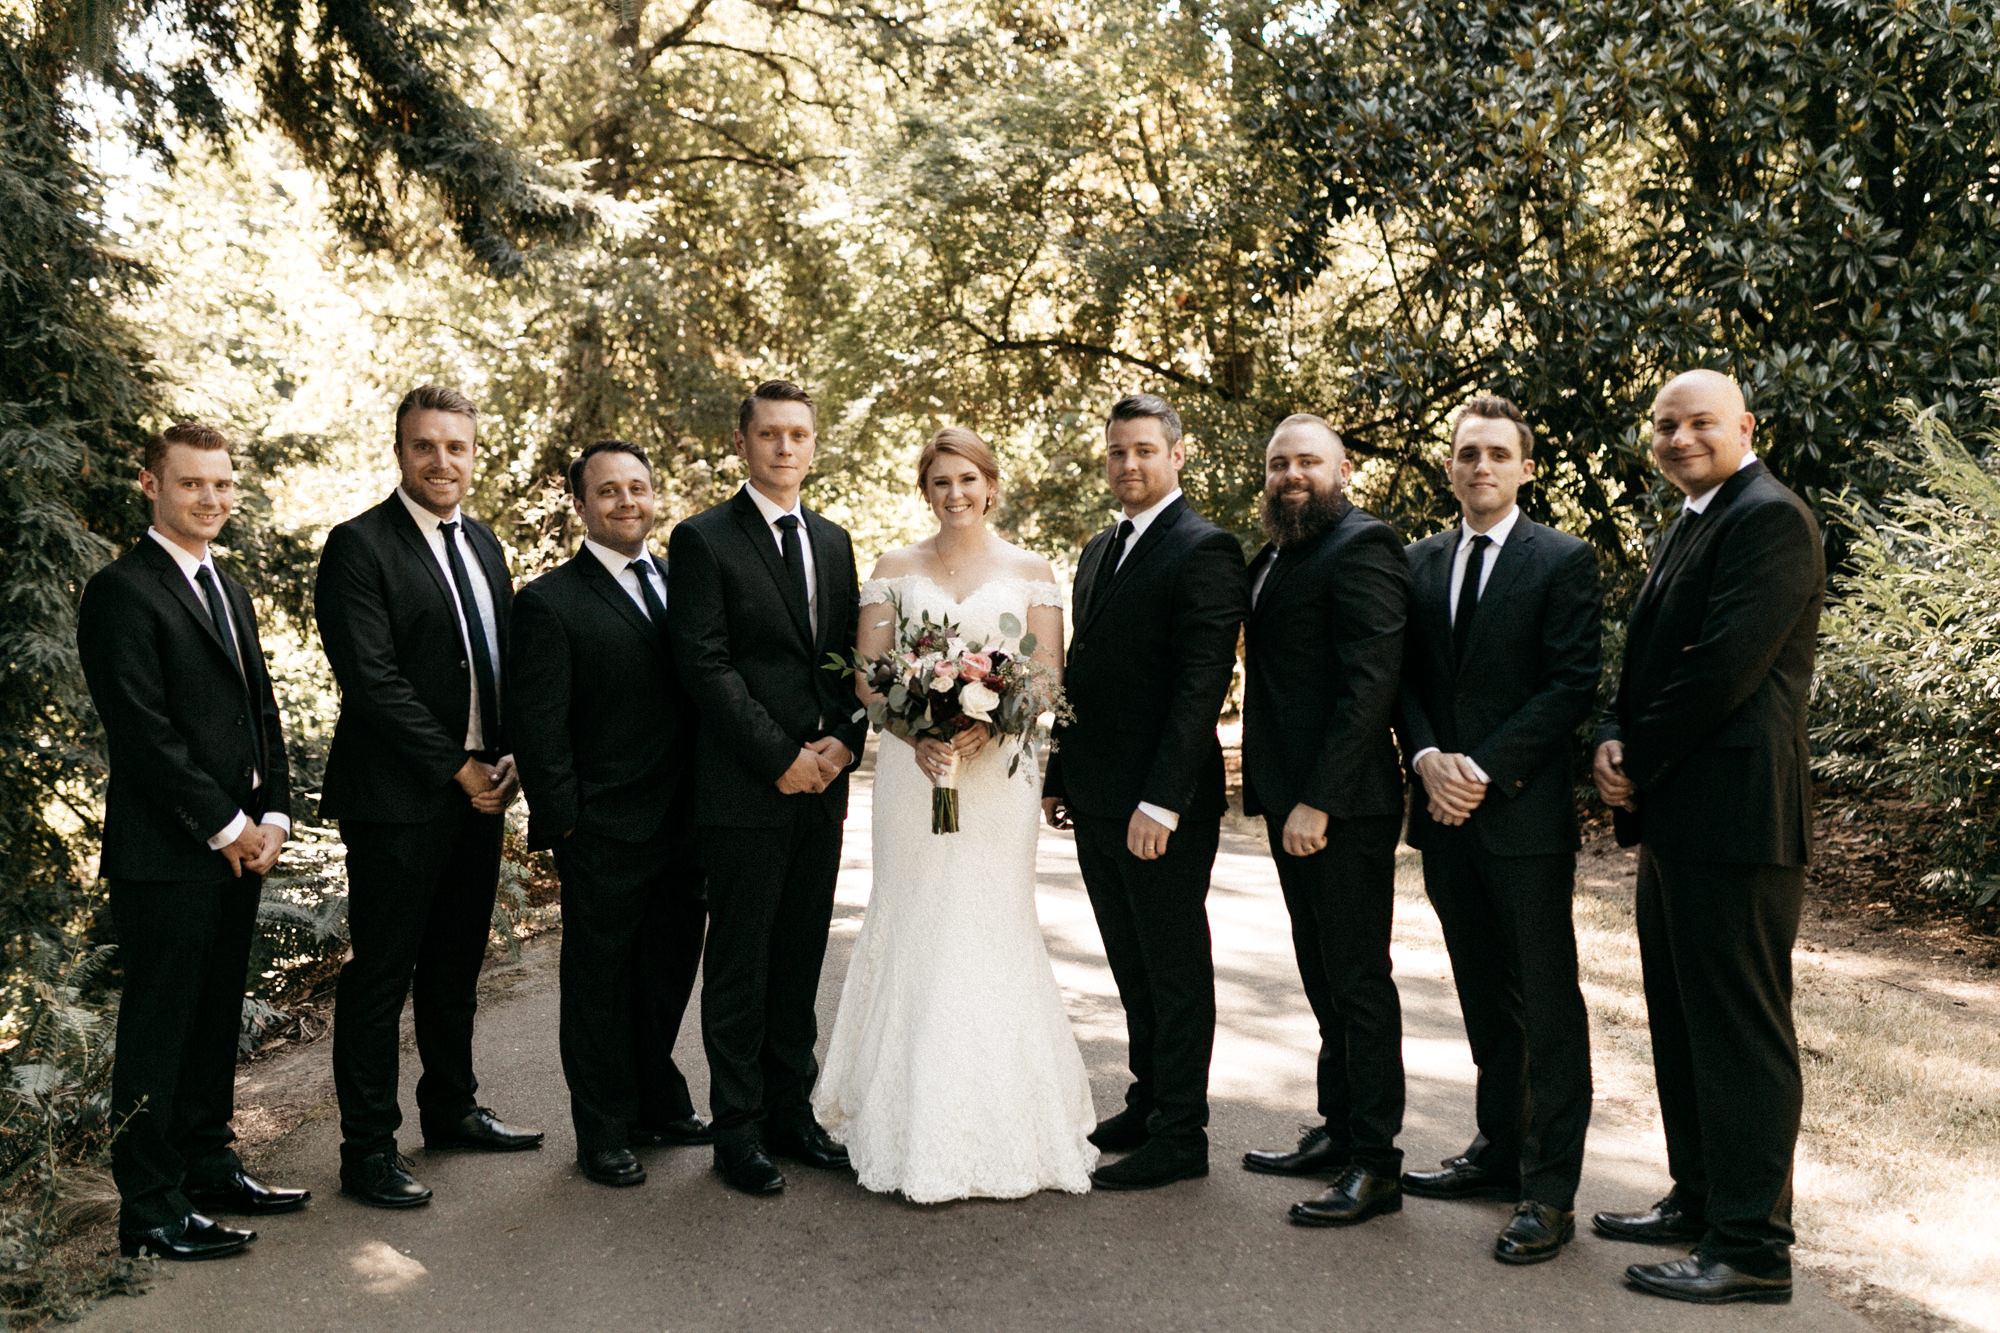 the_evergreen_portland_wedding-37.jpg